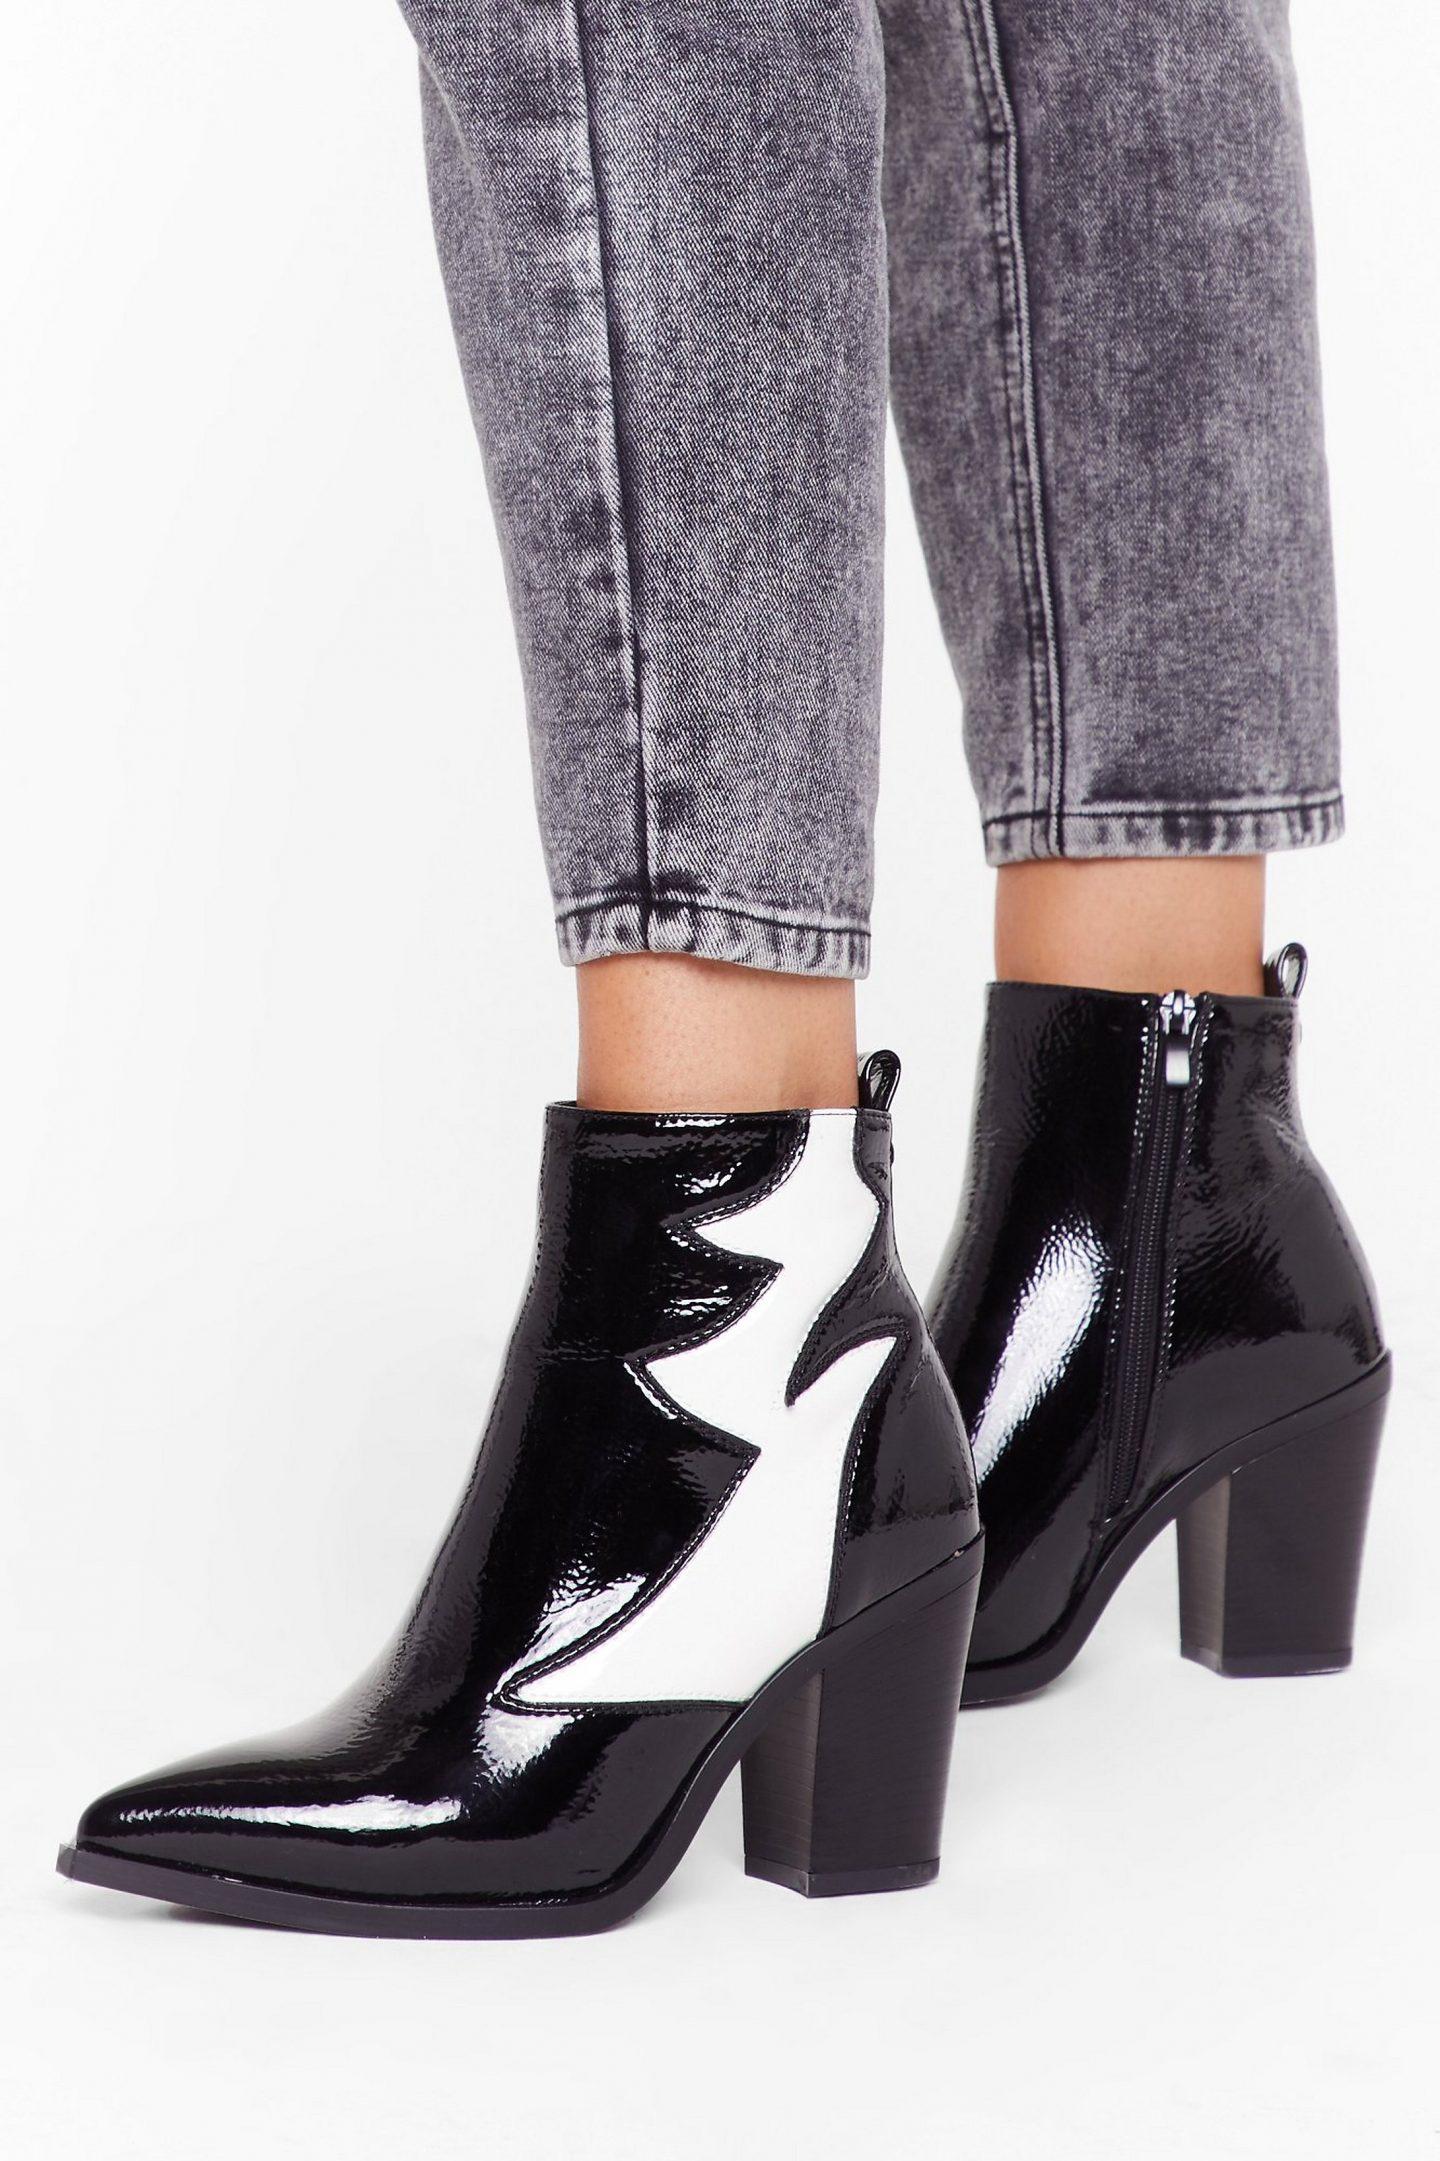 nasty gal boots and booties שירי ויצנר 2